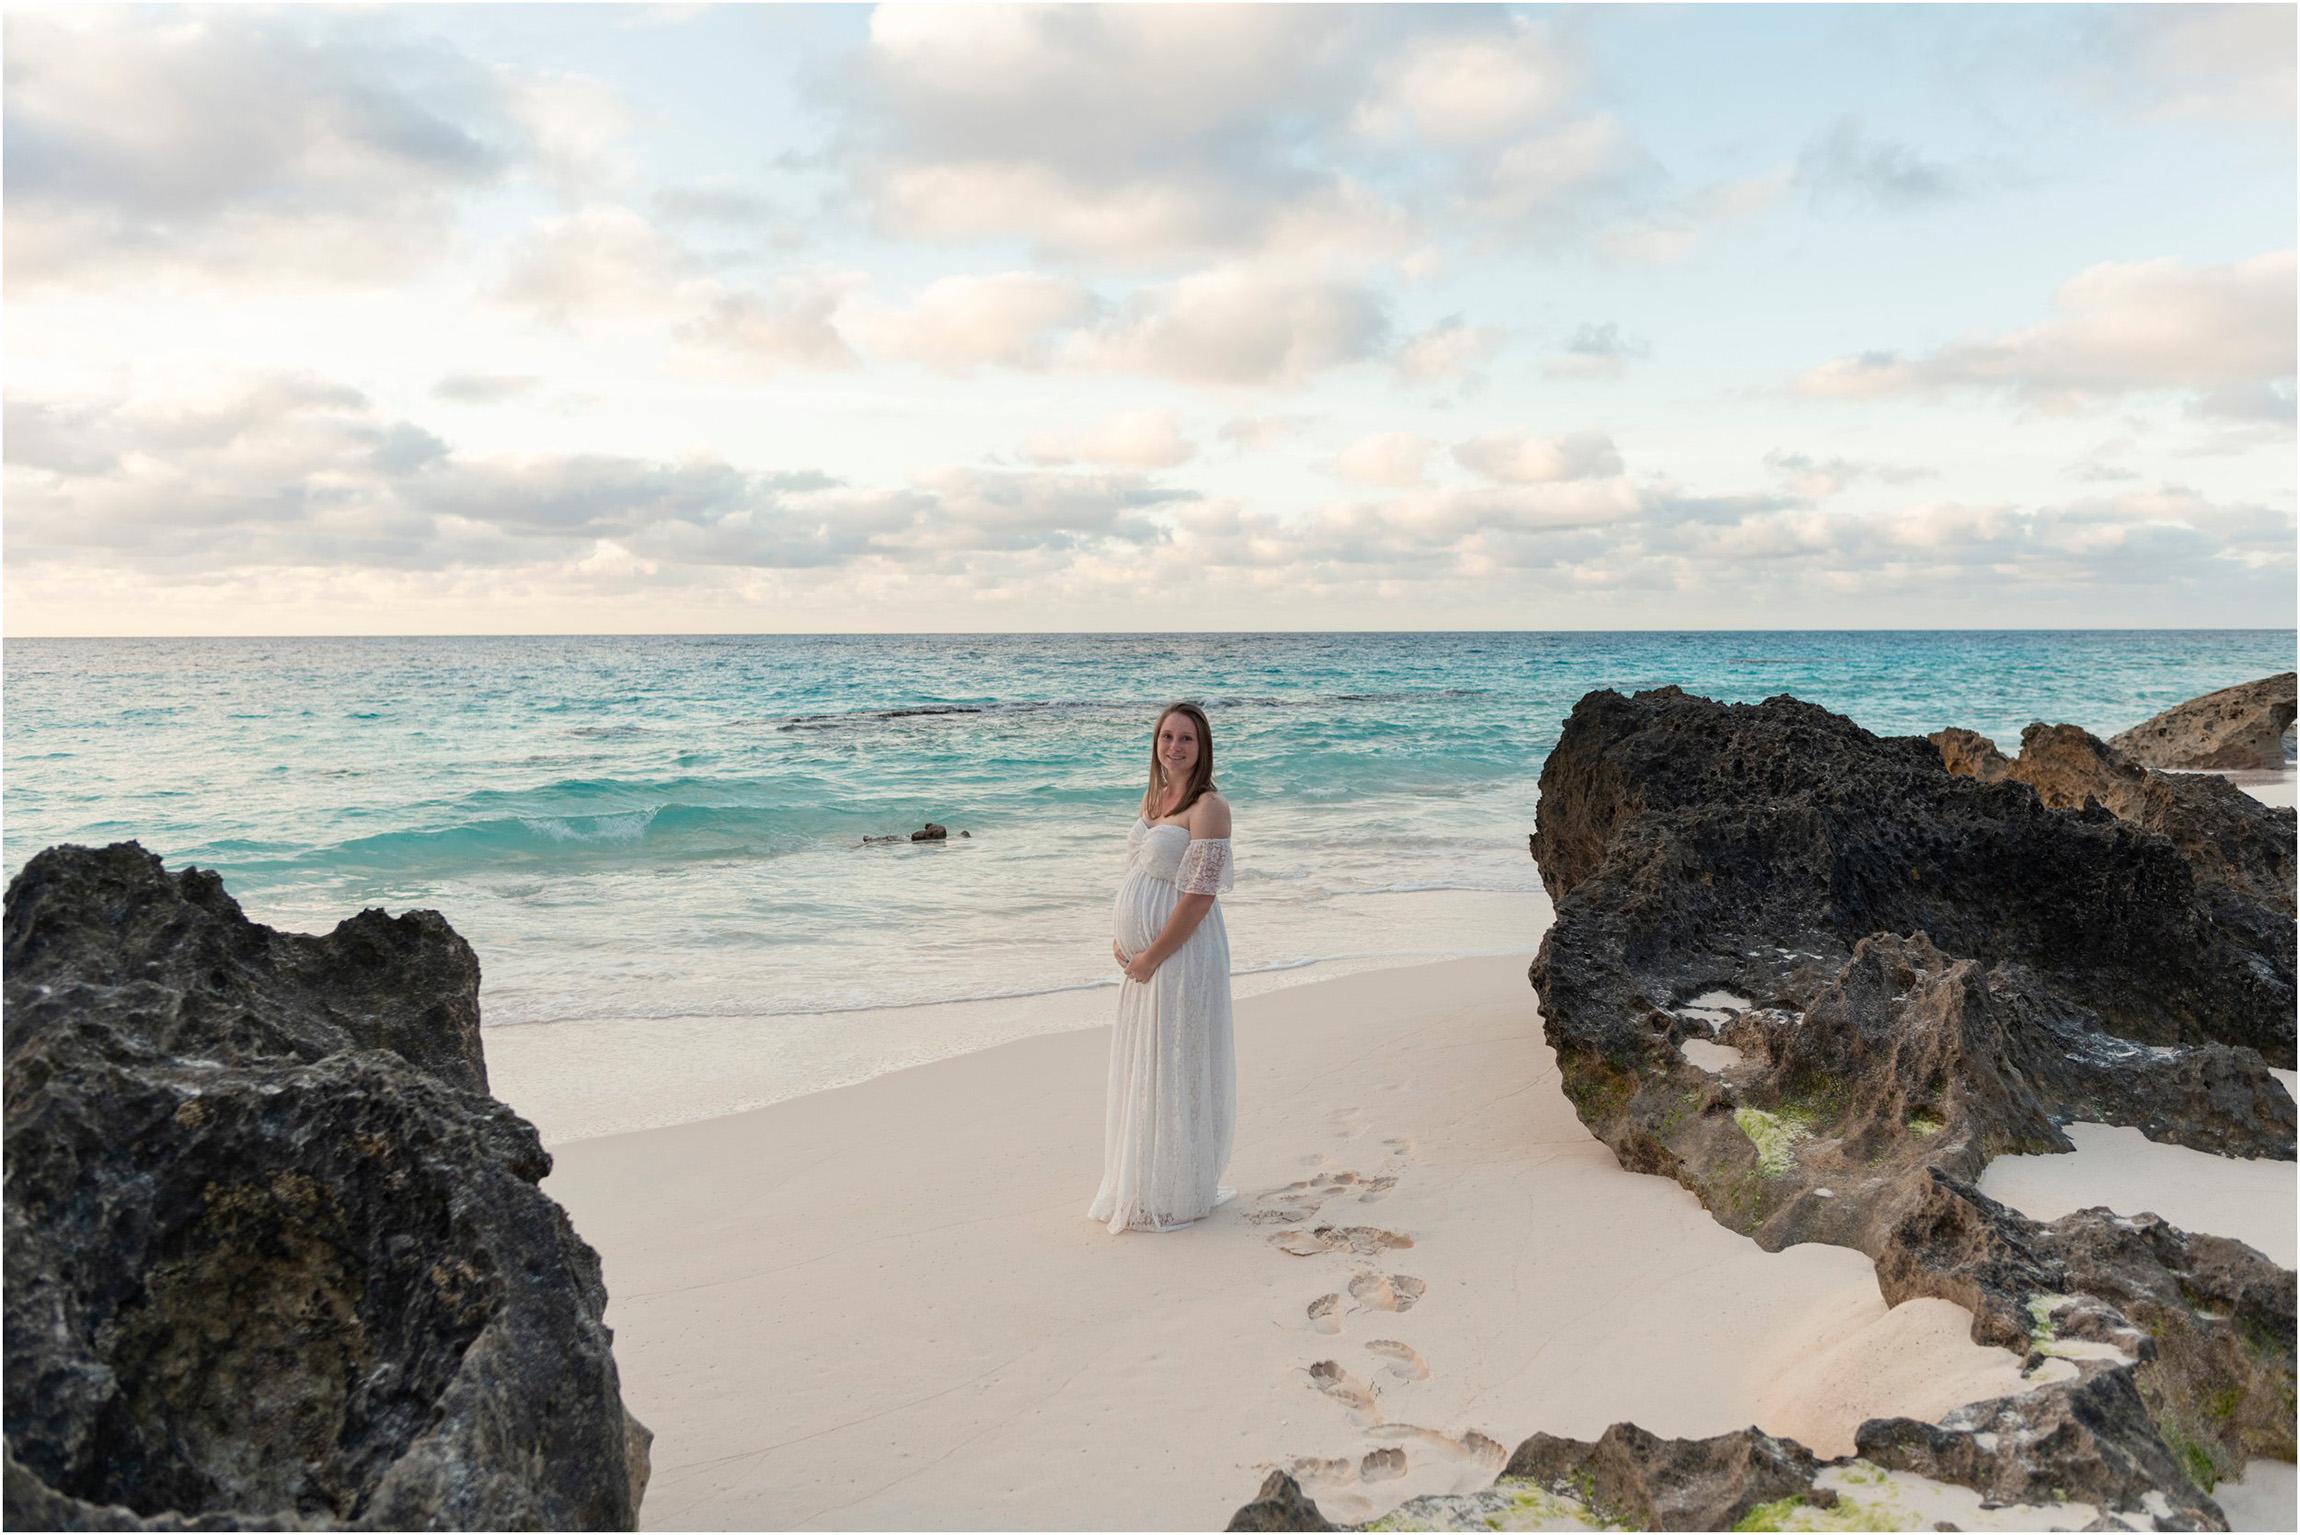 ©FianderFoto_Bermuda Maternity Photographer_Betsy_005.jpg